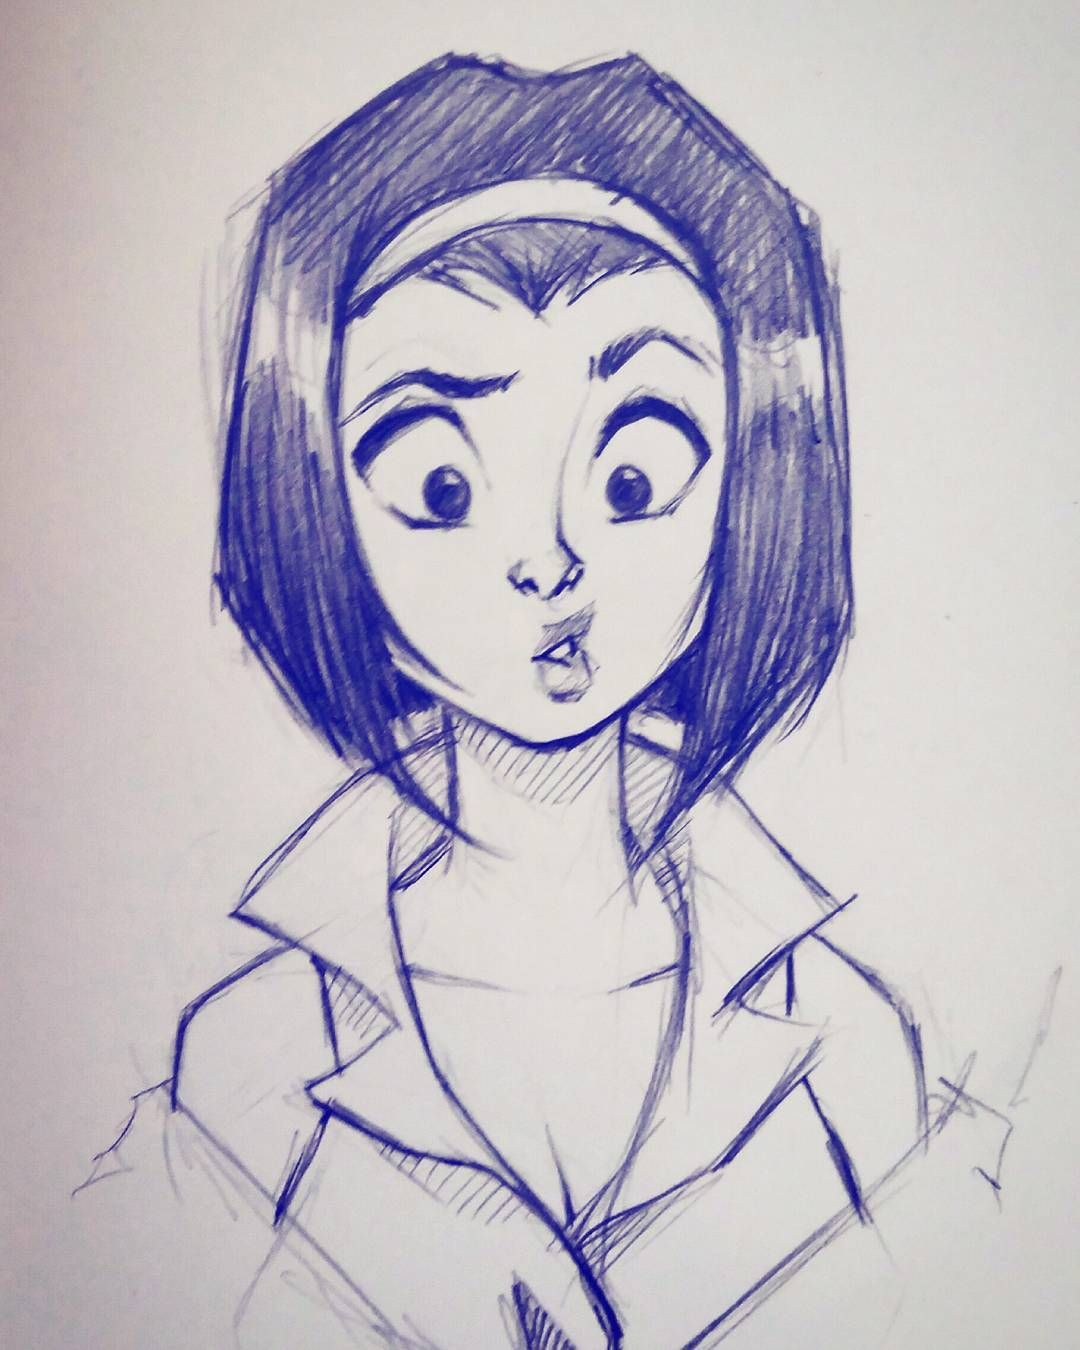 Character Design Instagram : Character design by cameron mark art instagram